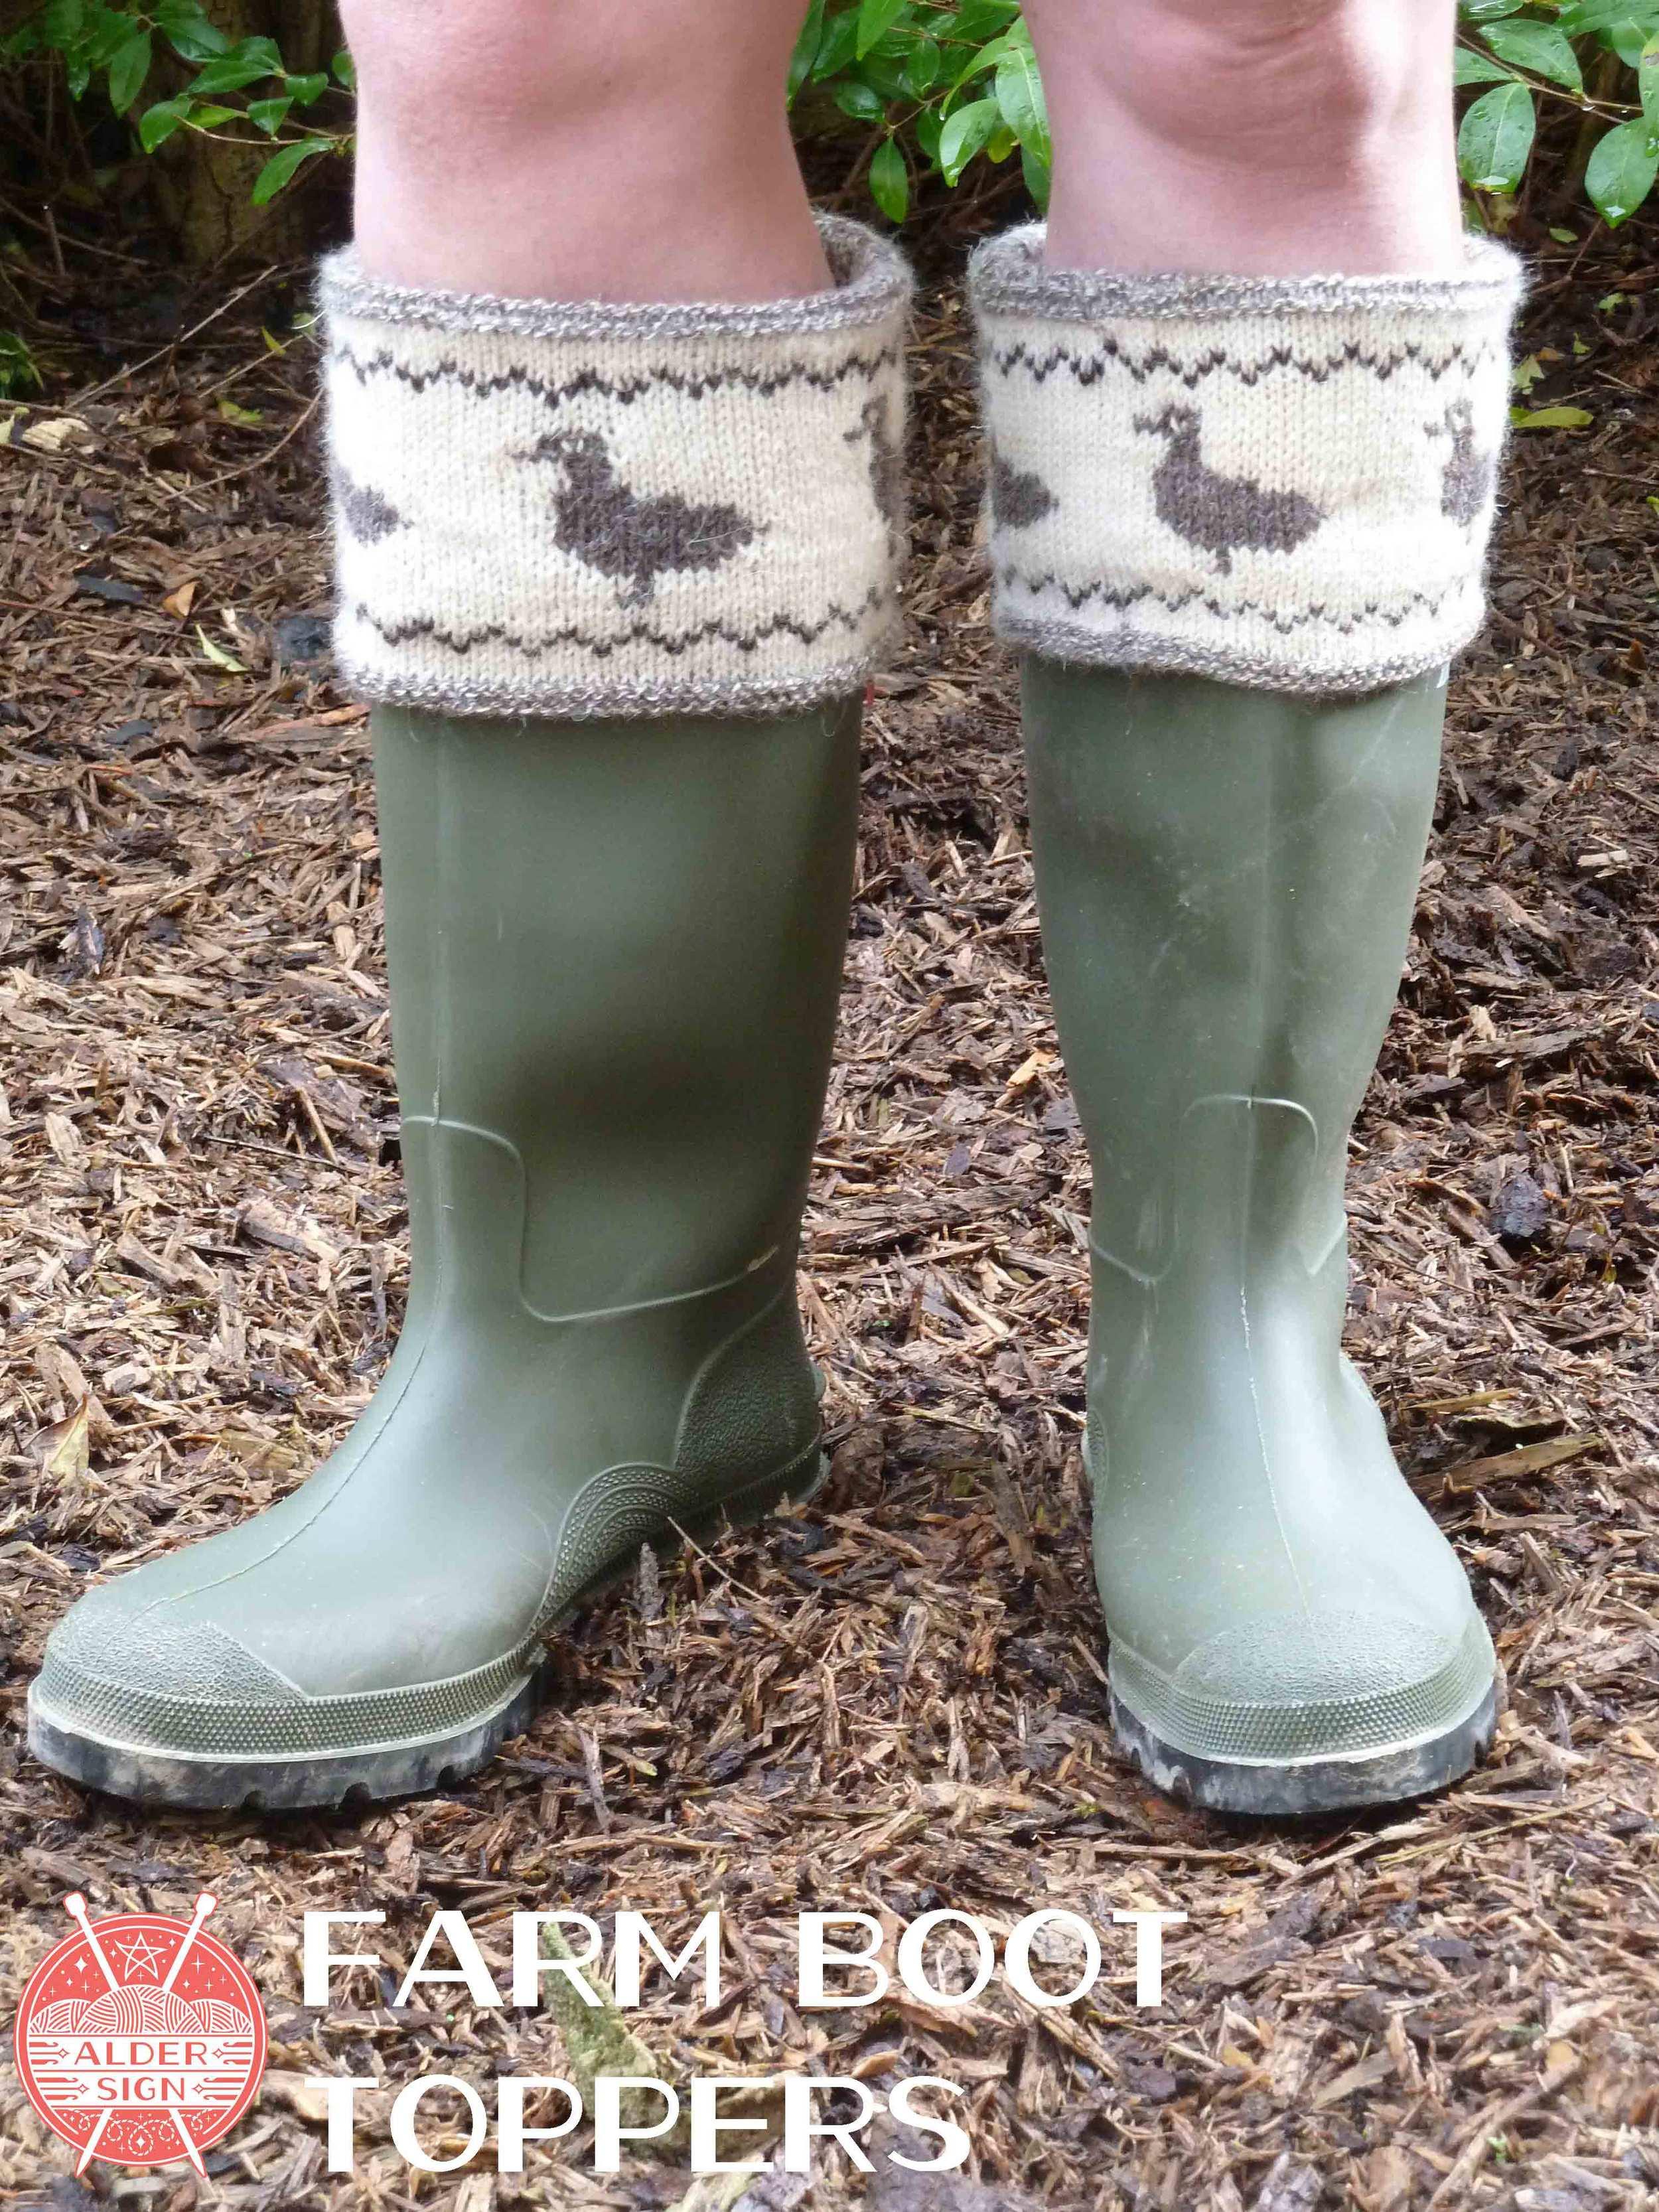 Farm-boot-toppers-logo2.jpg